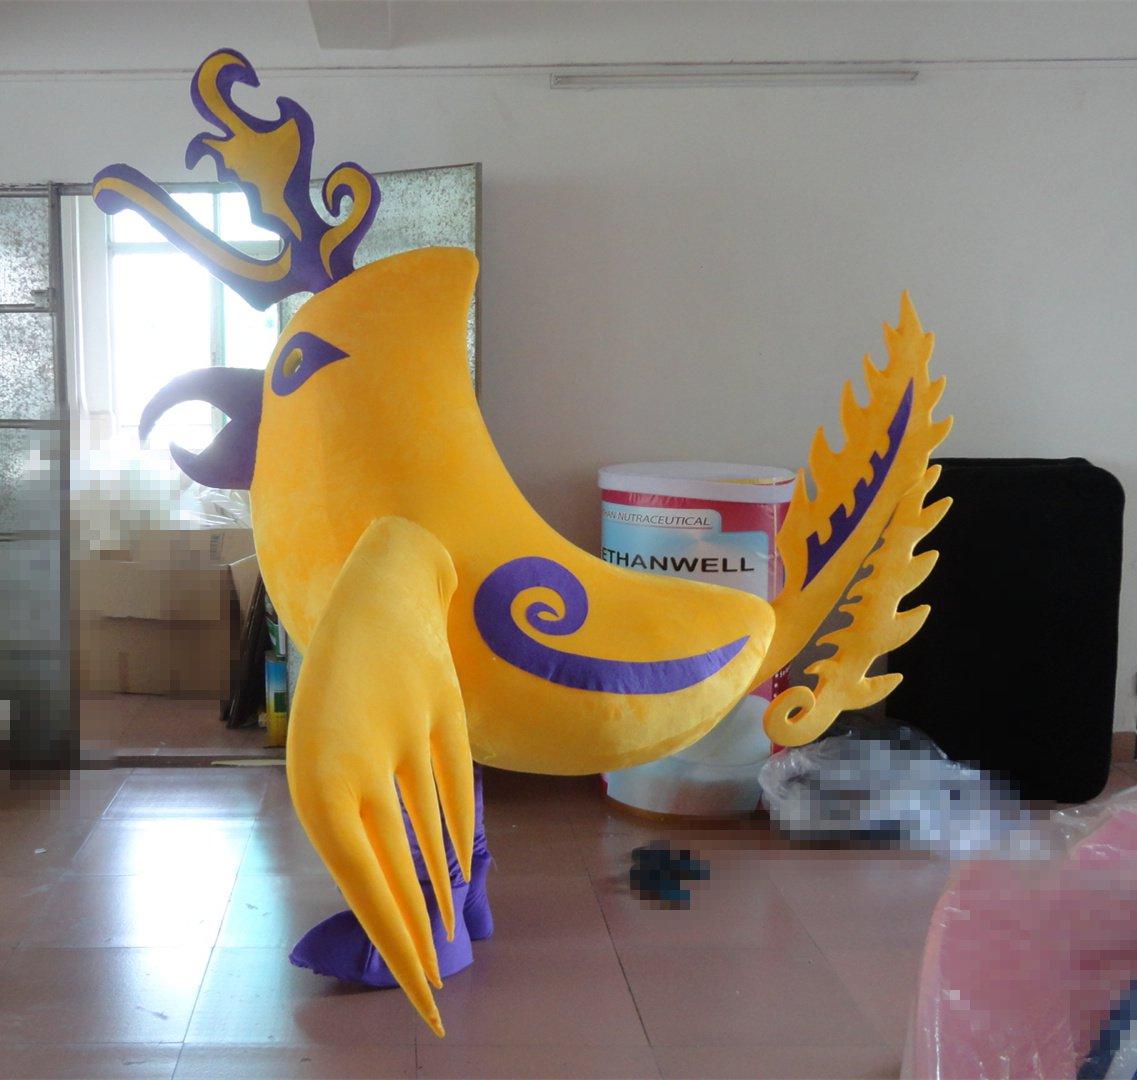 Professional Clothing Doll Clothing Giant Mascot Doll Pattern Cartoon Yellow Phoenix Birds Mascot Costume